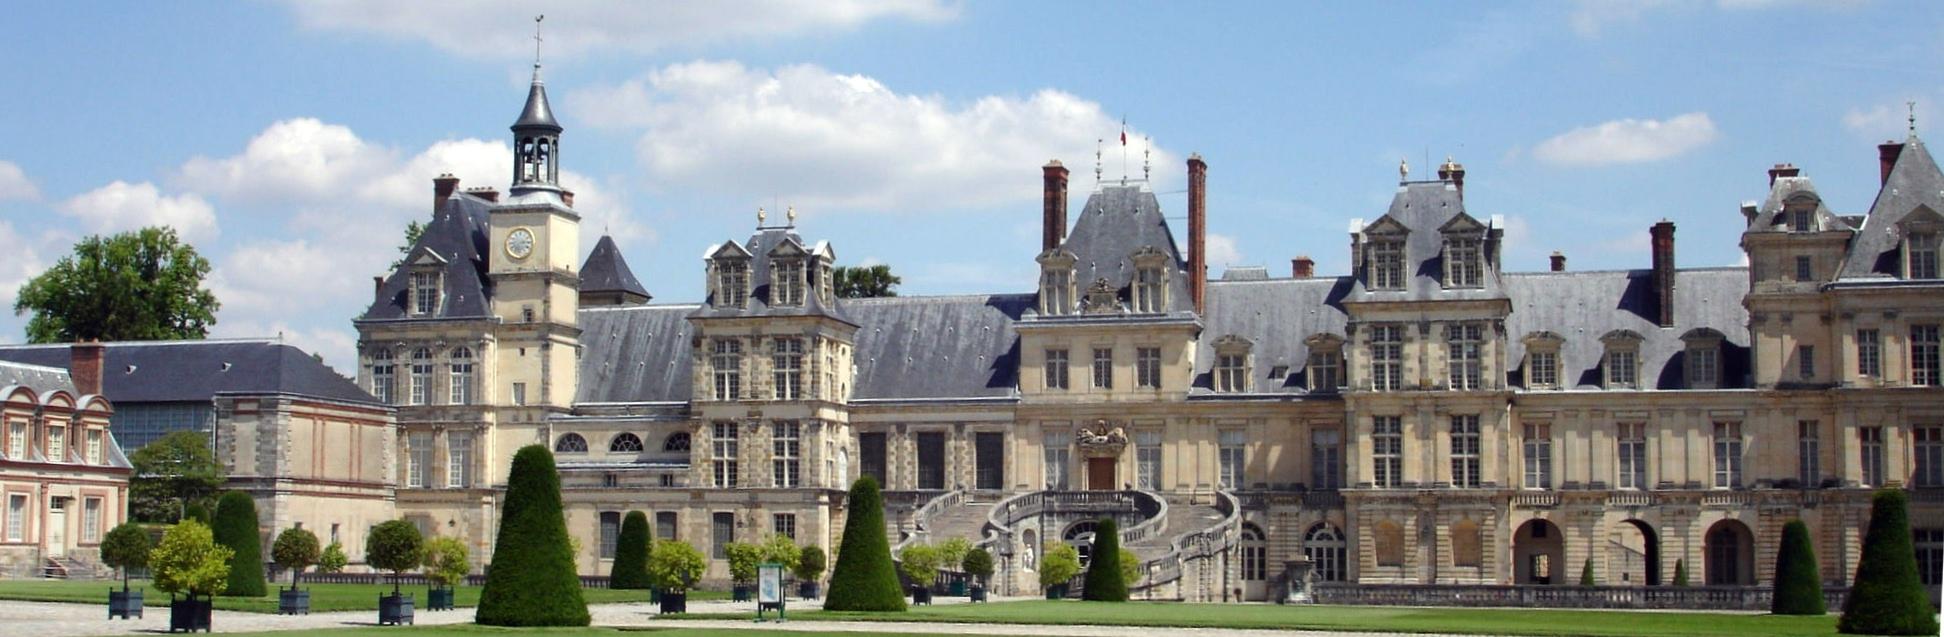 Fontainebleau la p pini re - Chambre hote fontainebleau ...